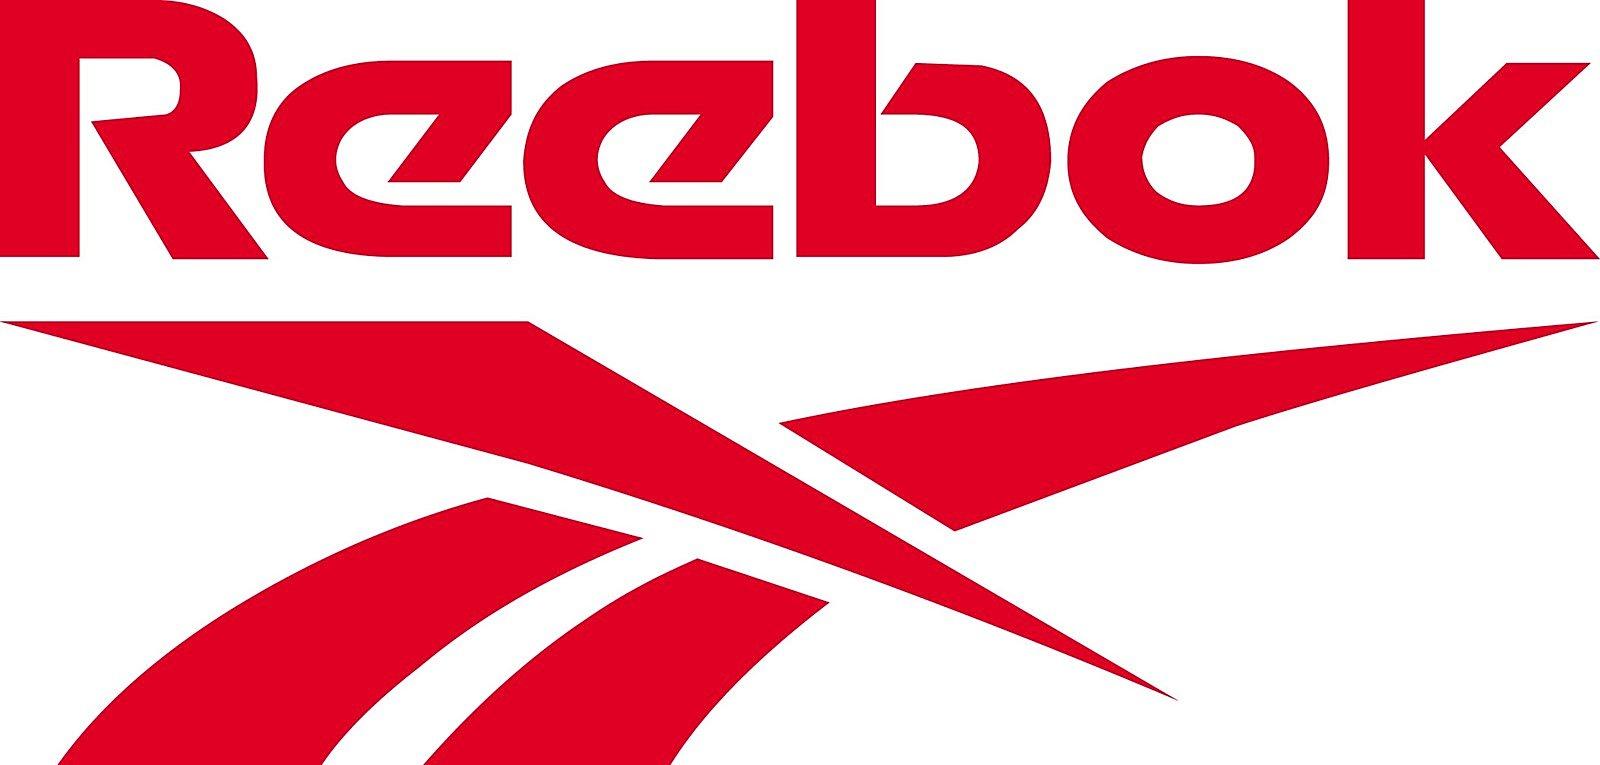 Buy reebok classic logo.